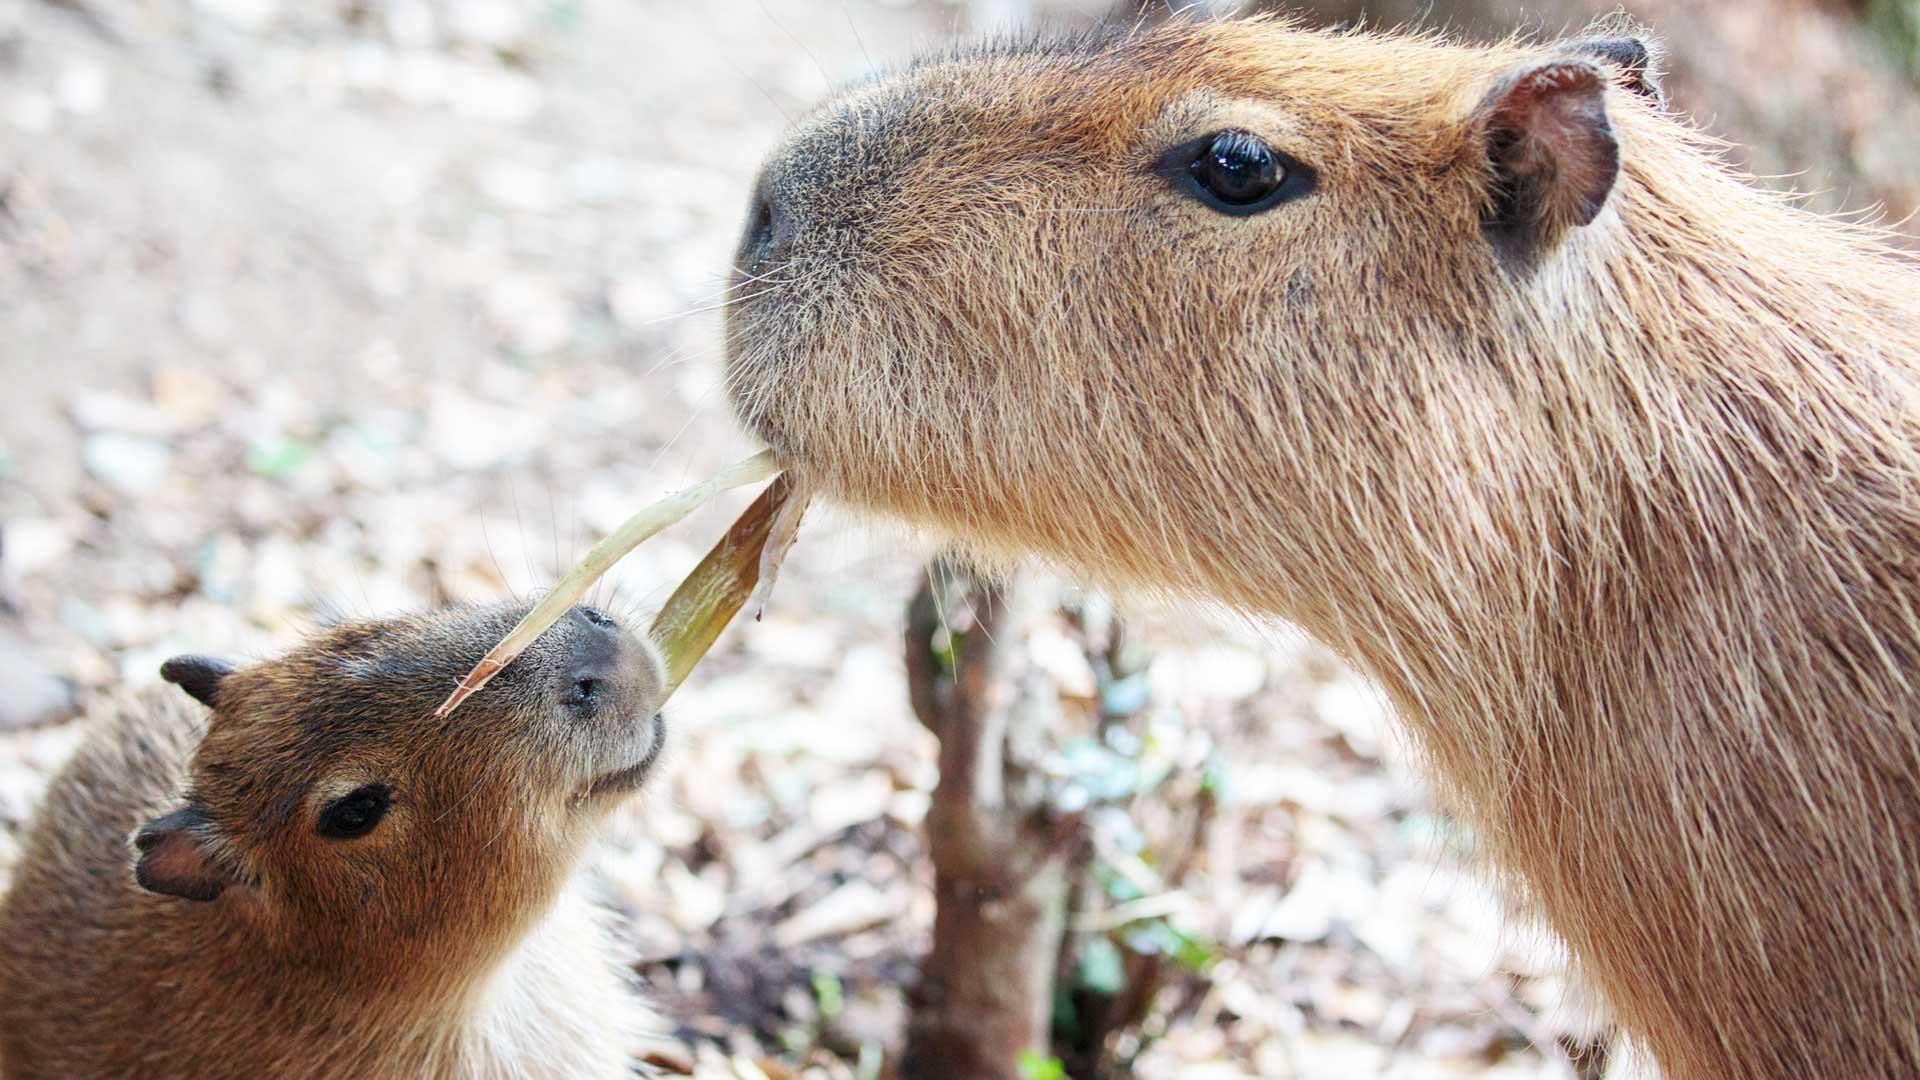 https://rfacdn.nz/zoo/assets/media/capybara-gallery-2.jpg